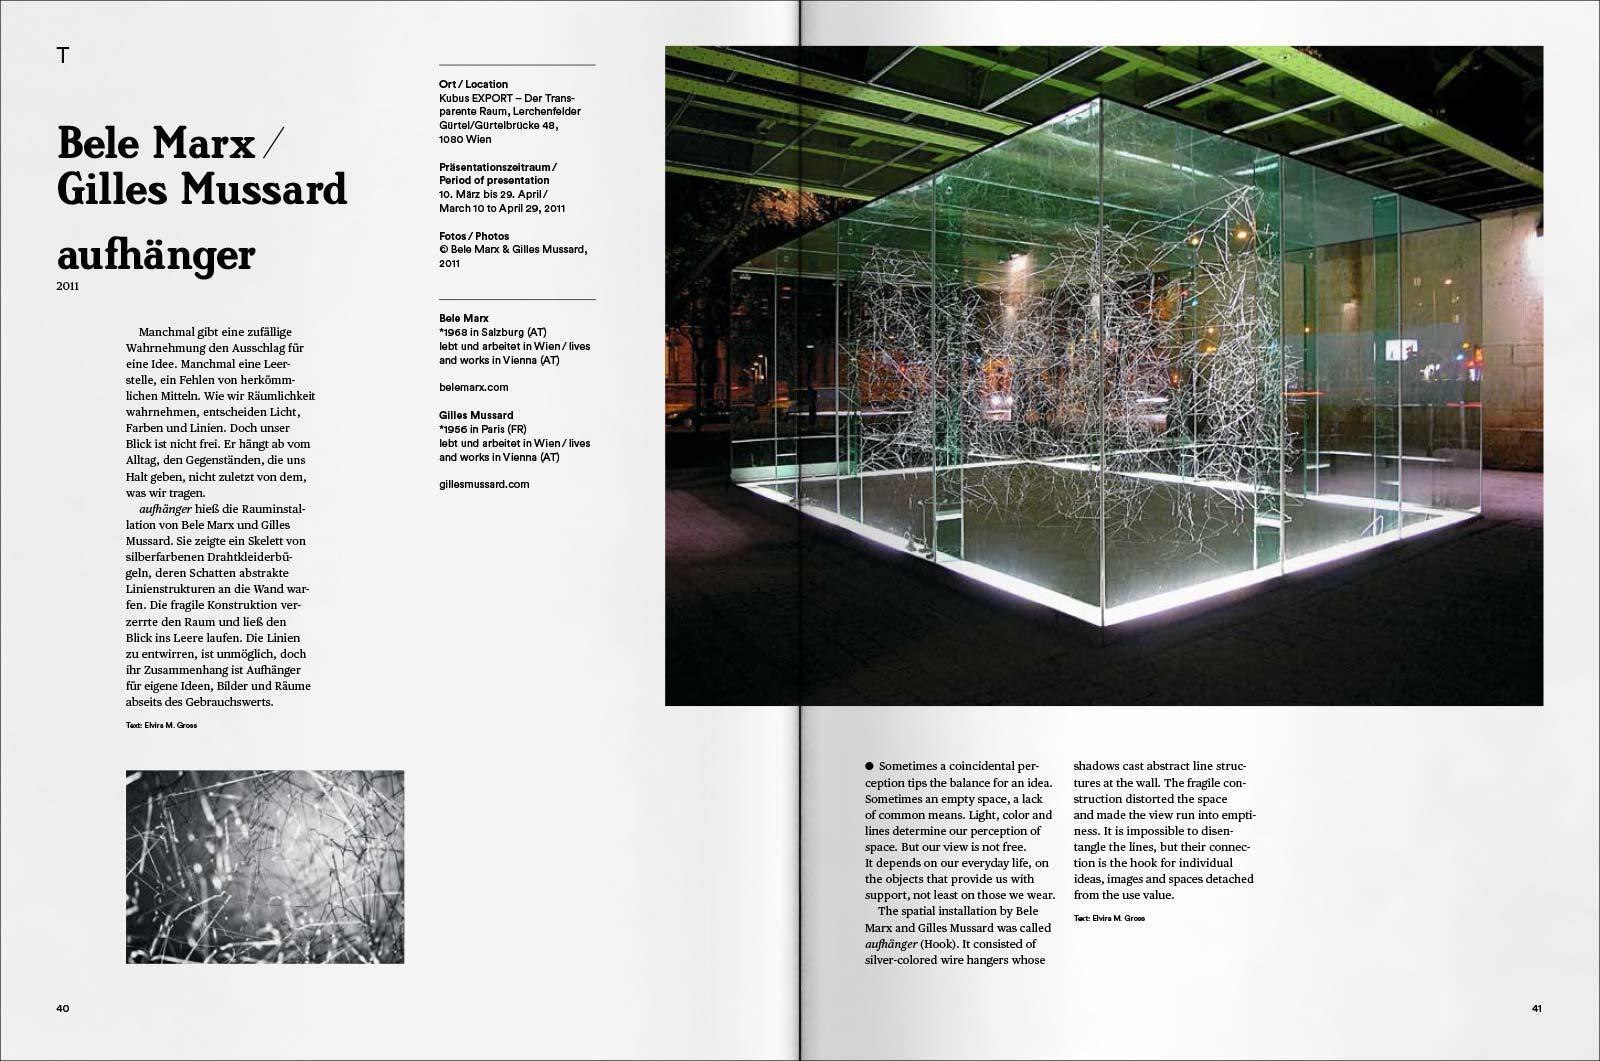 Public art vienna III spread03